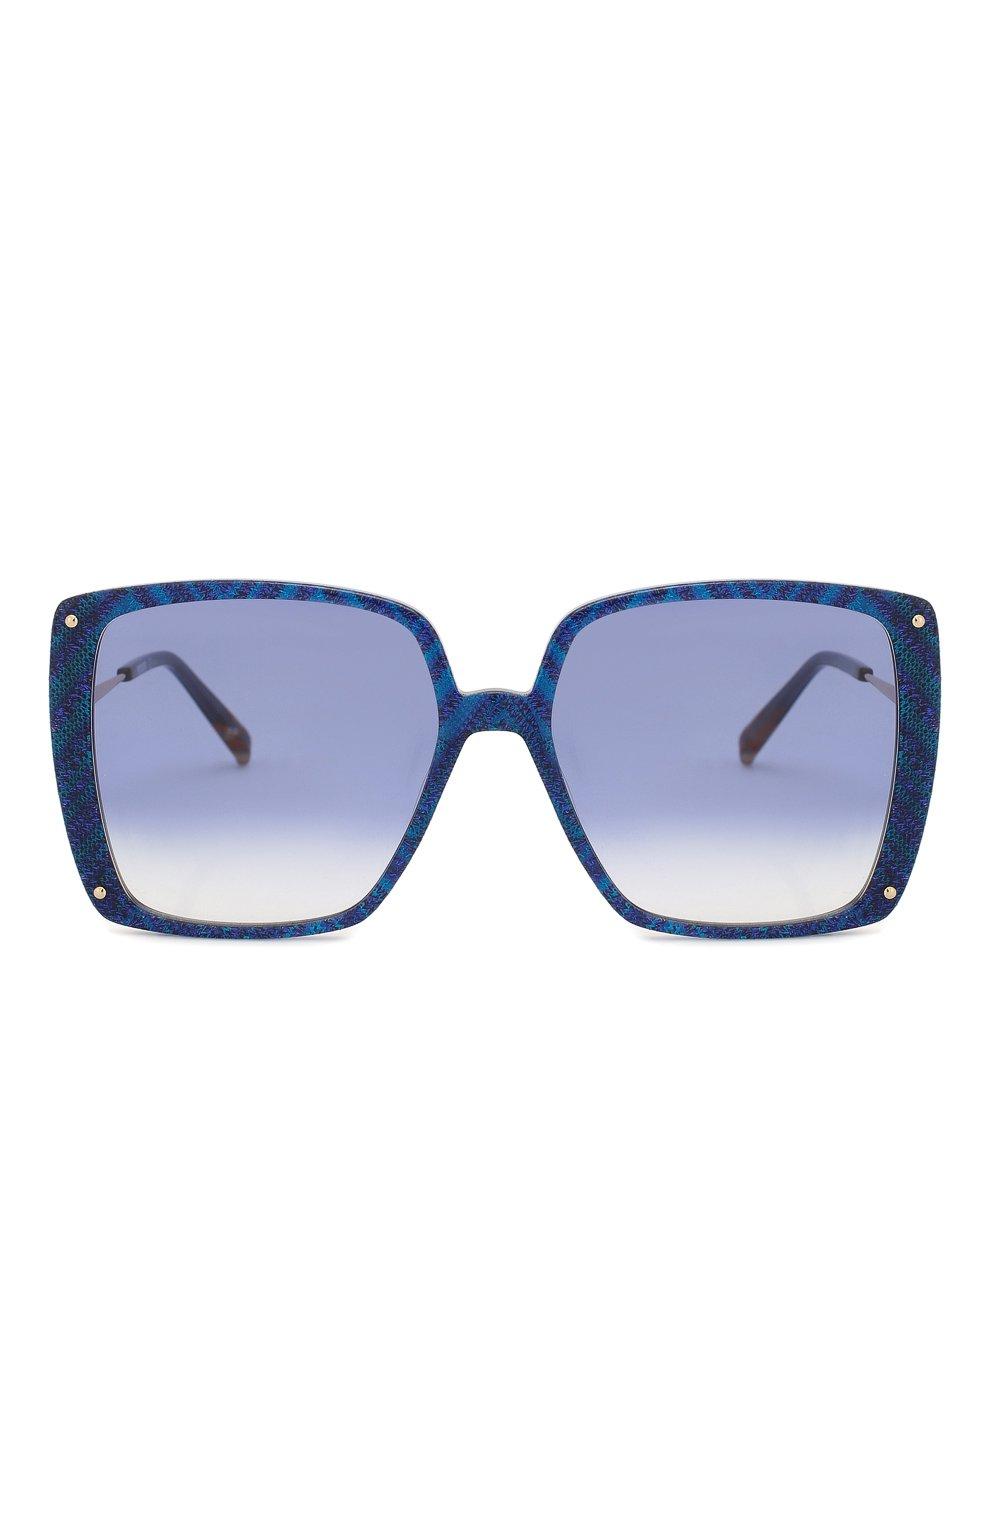 Женские солнцезащитные очки MISSONI синего цвета, арт. MIS0002 S6F | Фото 3